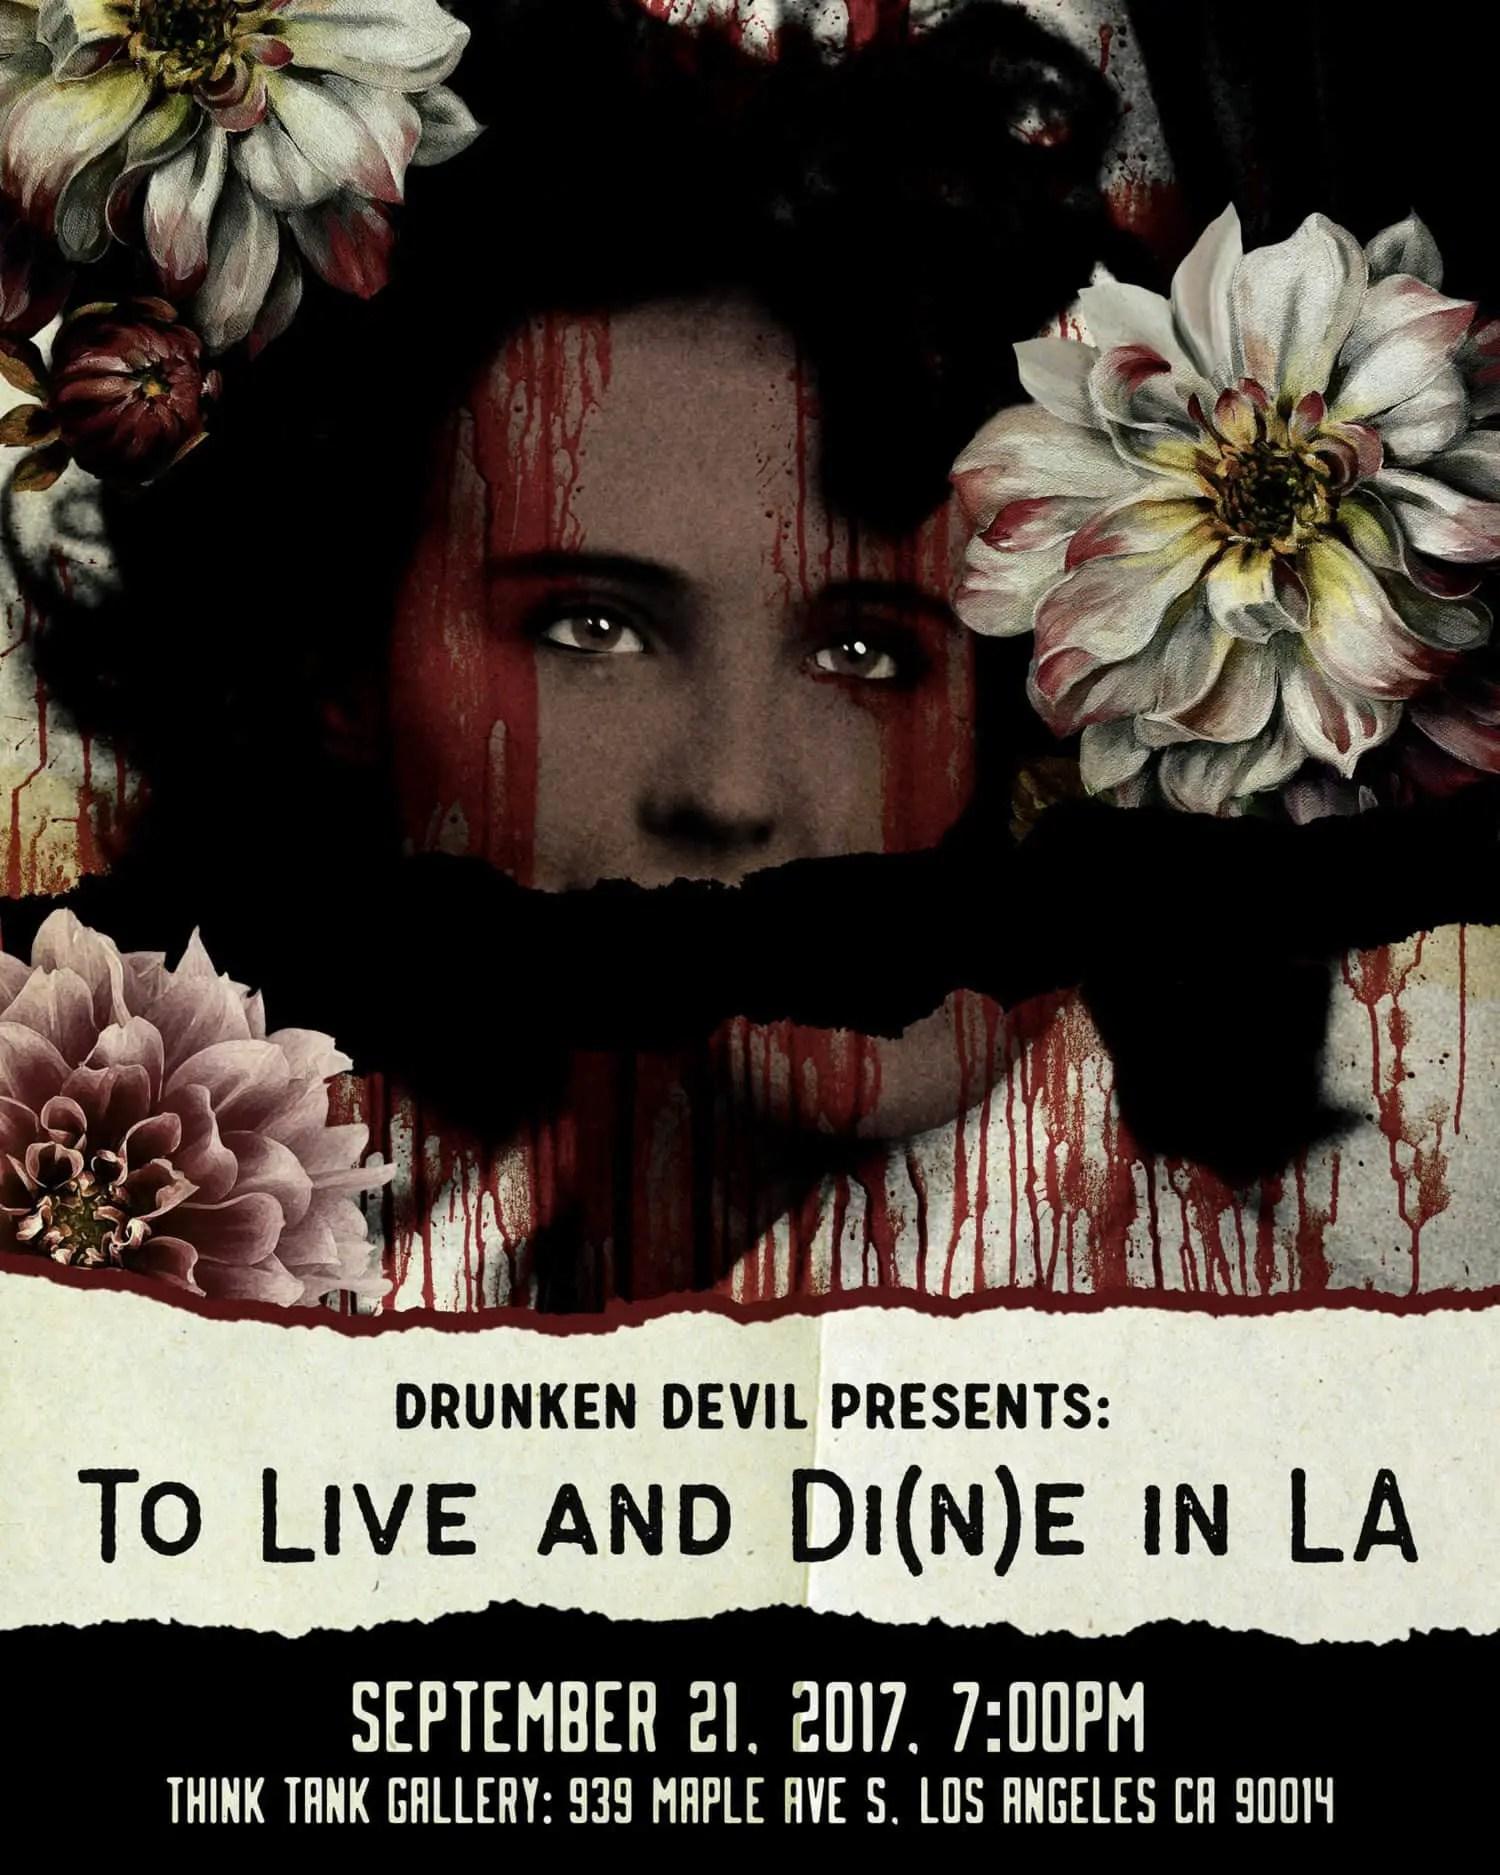 To Live and Dine in LA - Dinner Theater - Drunken Devil - Serial Killers - Los Angeles True Crime History